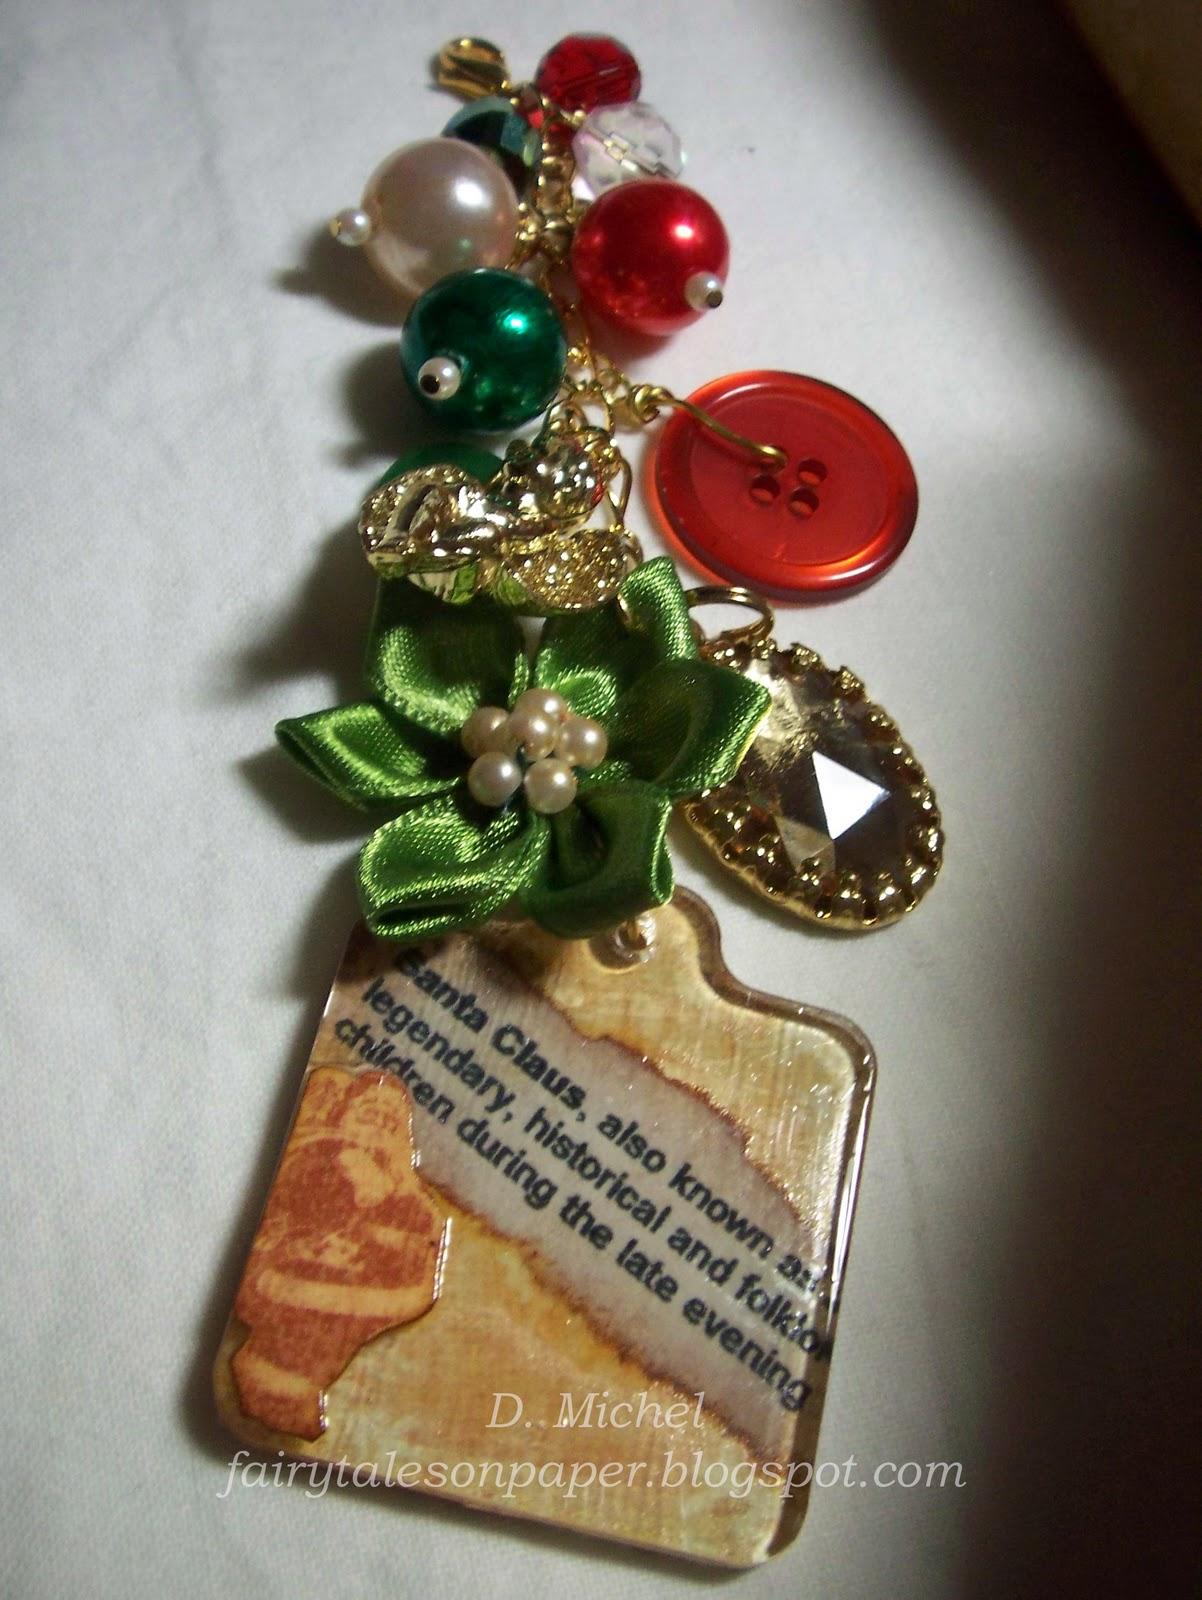 http://2.bp.blogspot.com/_DbiKwg4yG8s/TSkp2BdvkqI/AAAAAAAAAGE/LuOWYrZXPEo/s1600/matchbox+charm.jpg